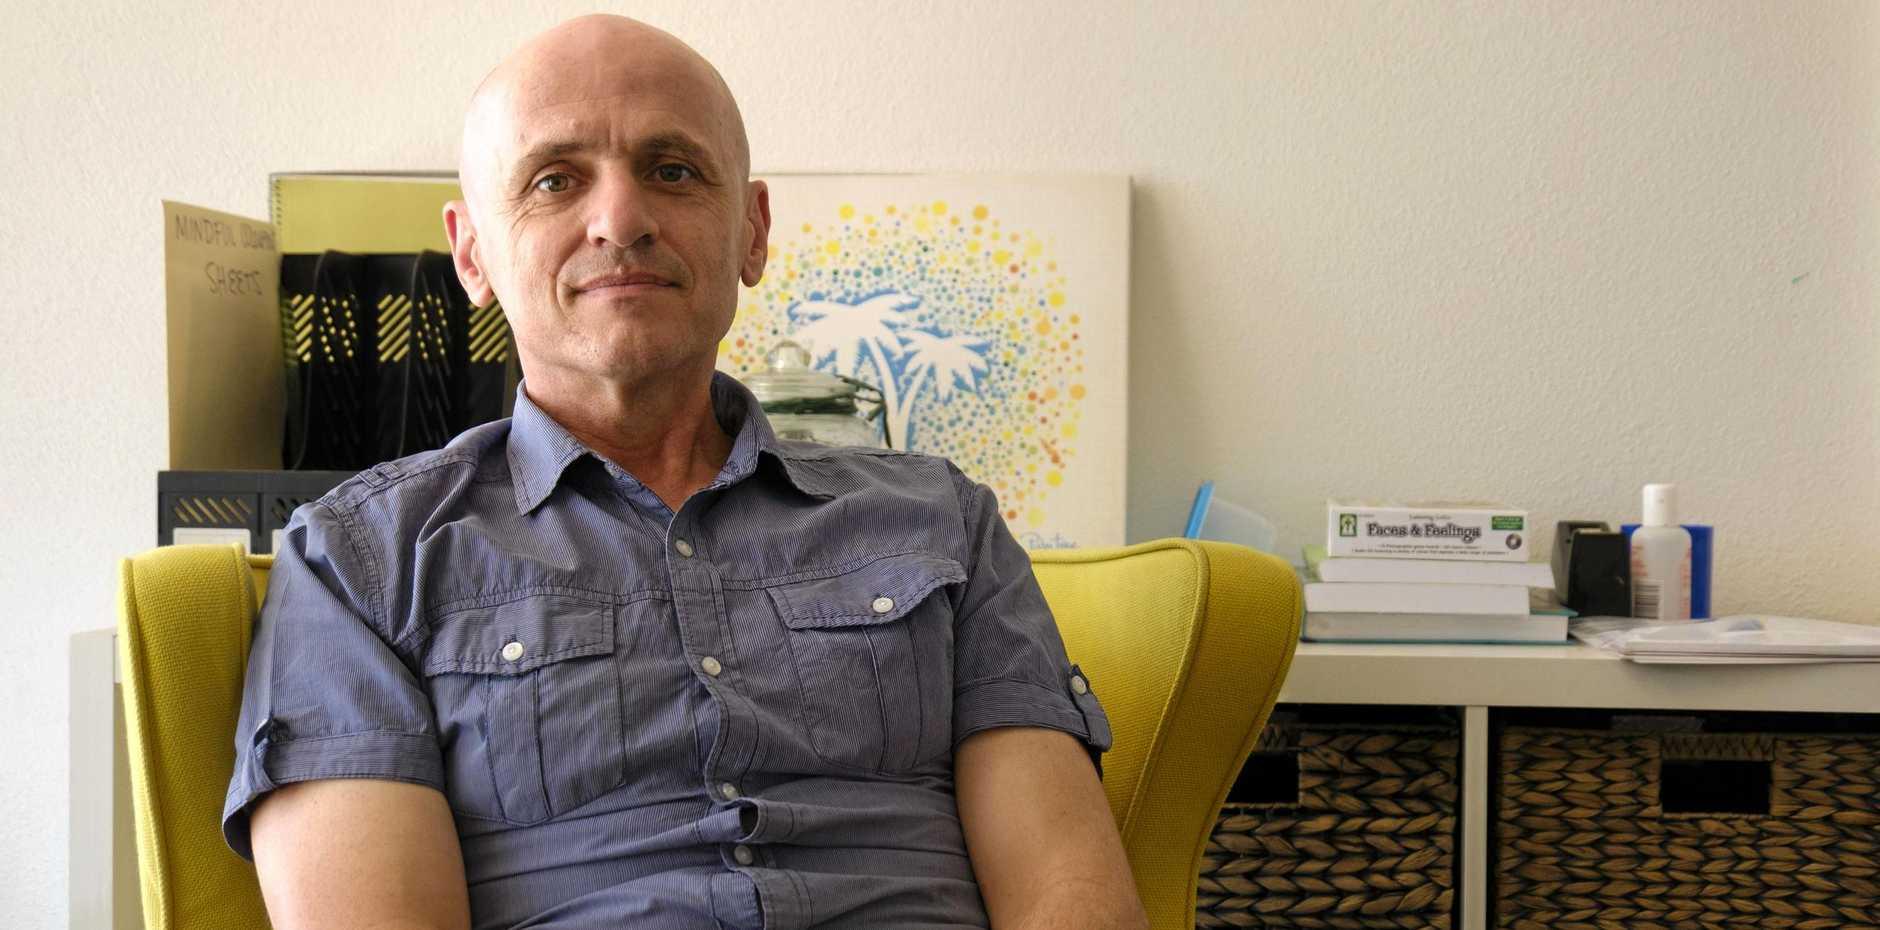 SUPPORT: Bridges program leader Brett Hayes said a rehab facility is not what Bundaberg needs.